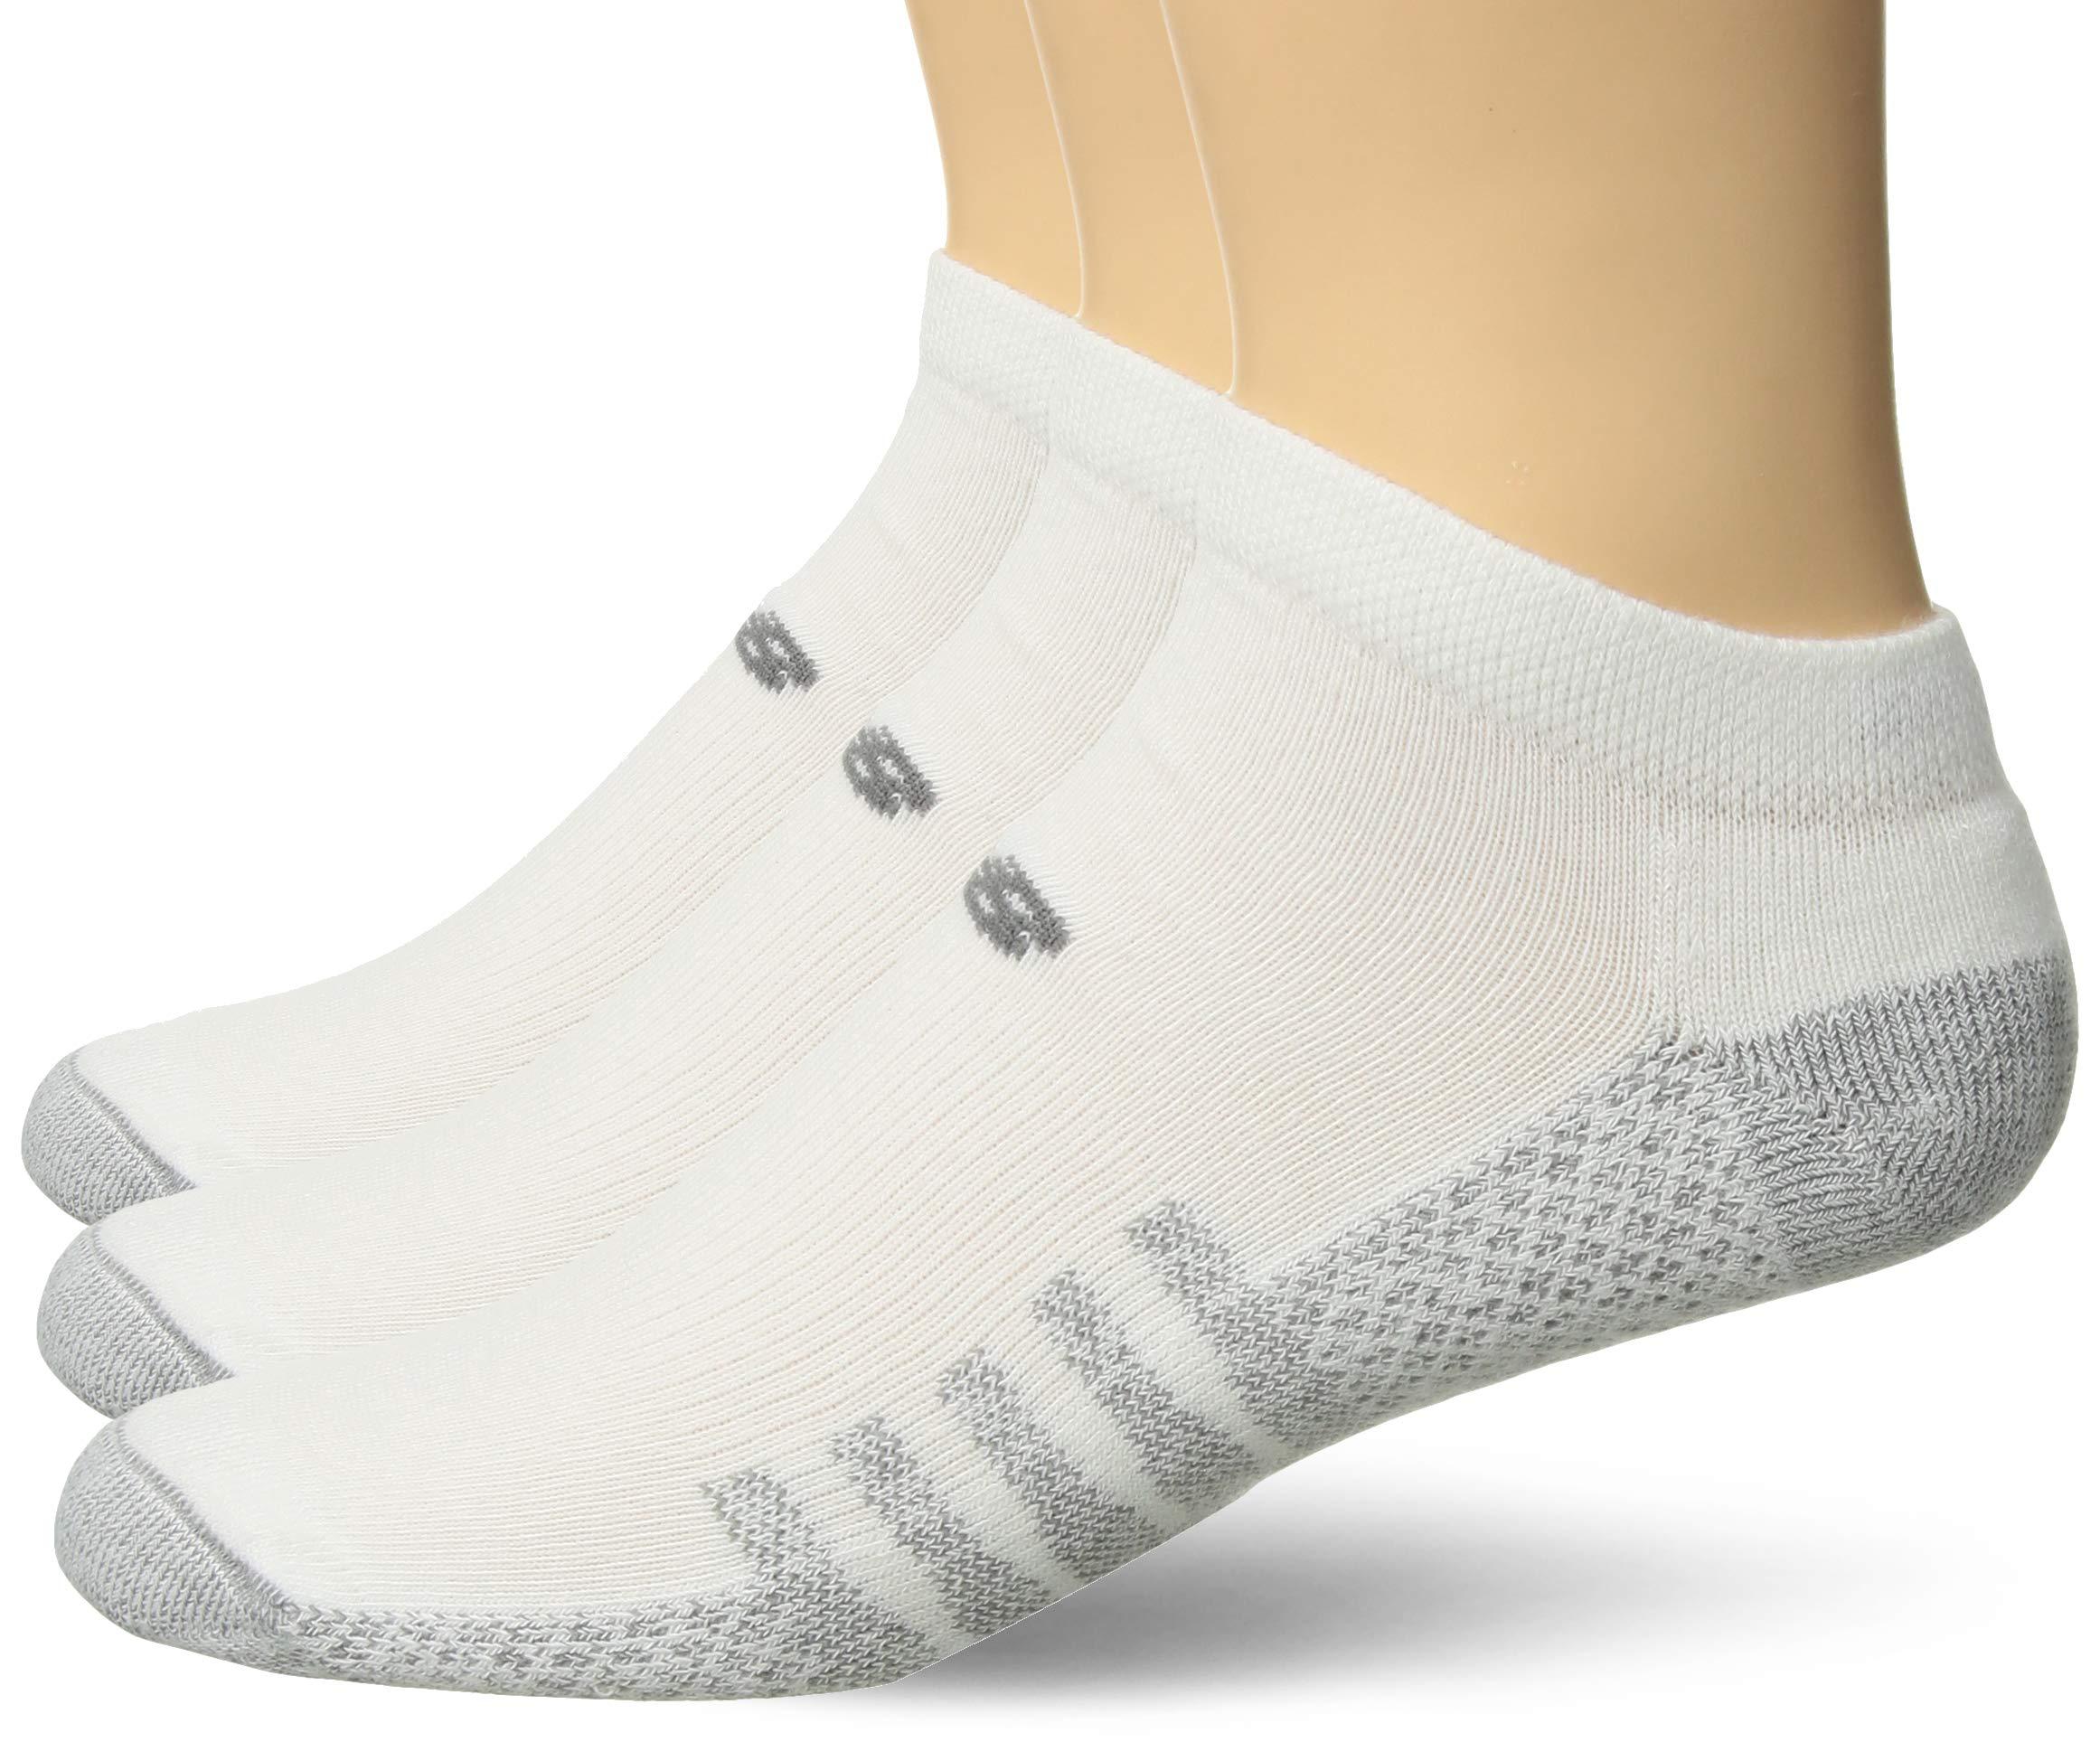 New Balance Coolmax Socks X Large